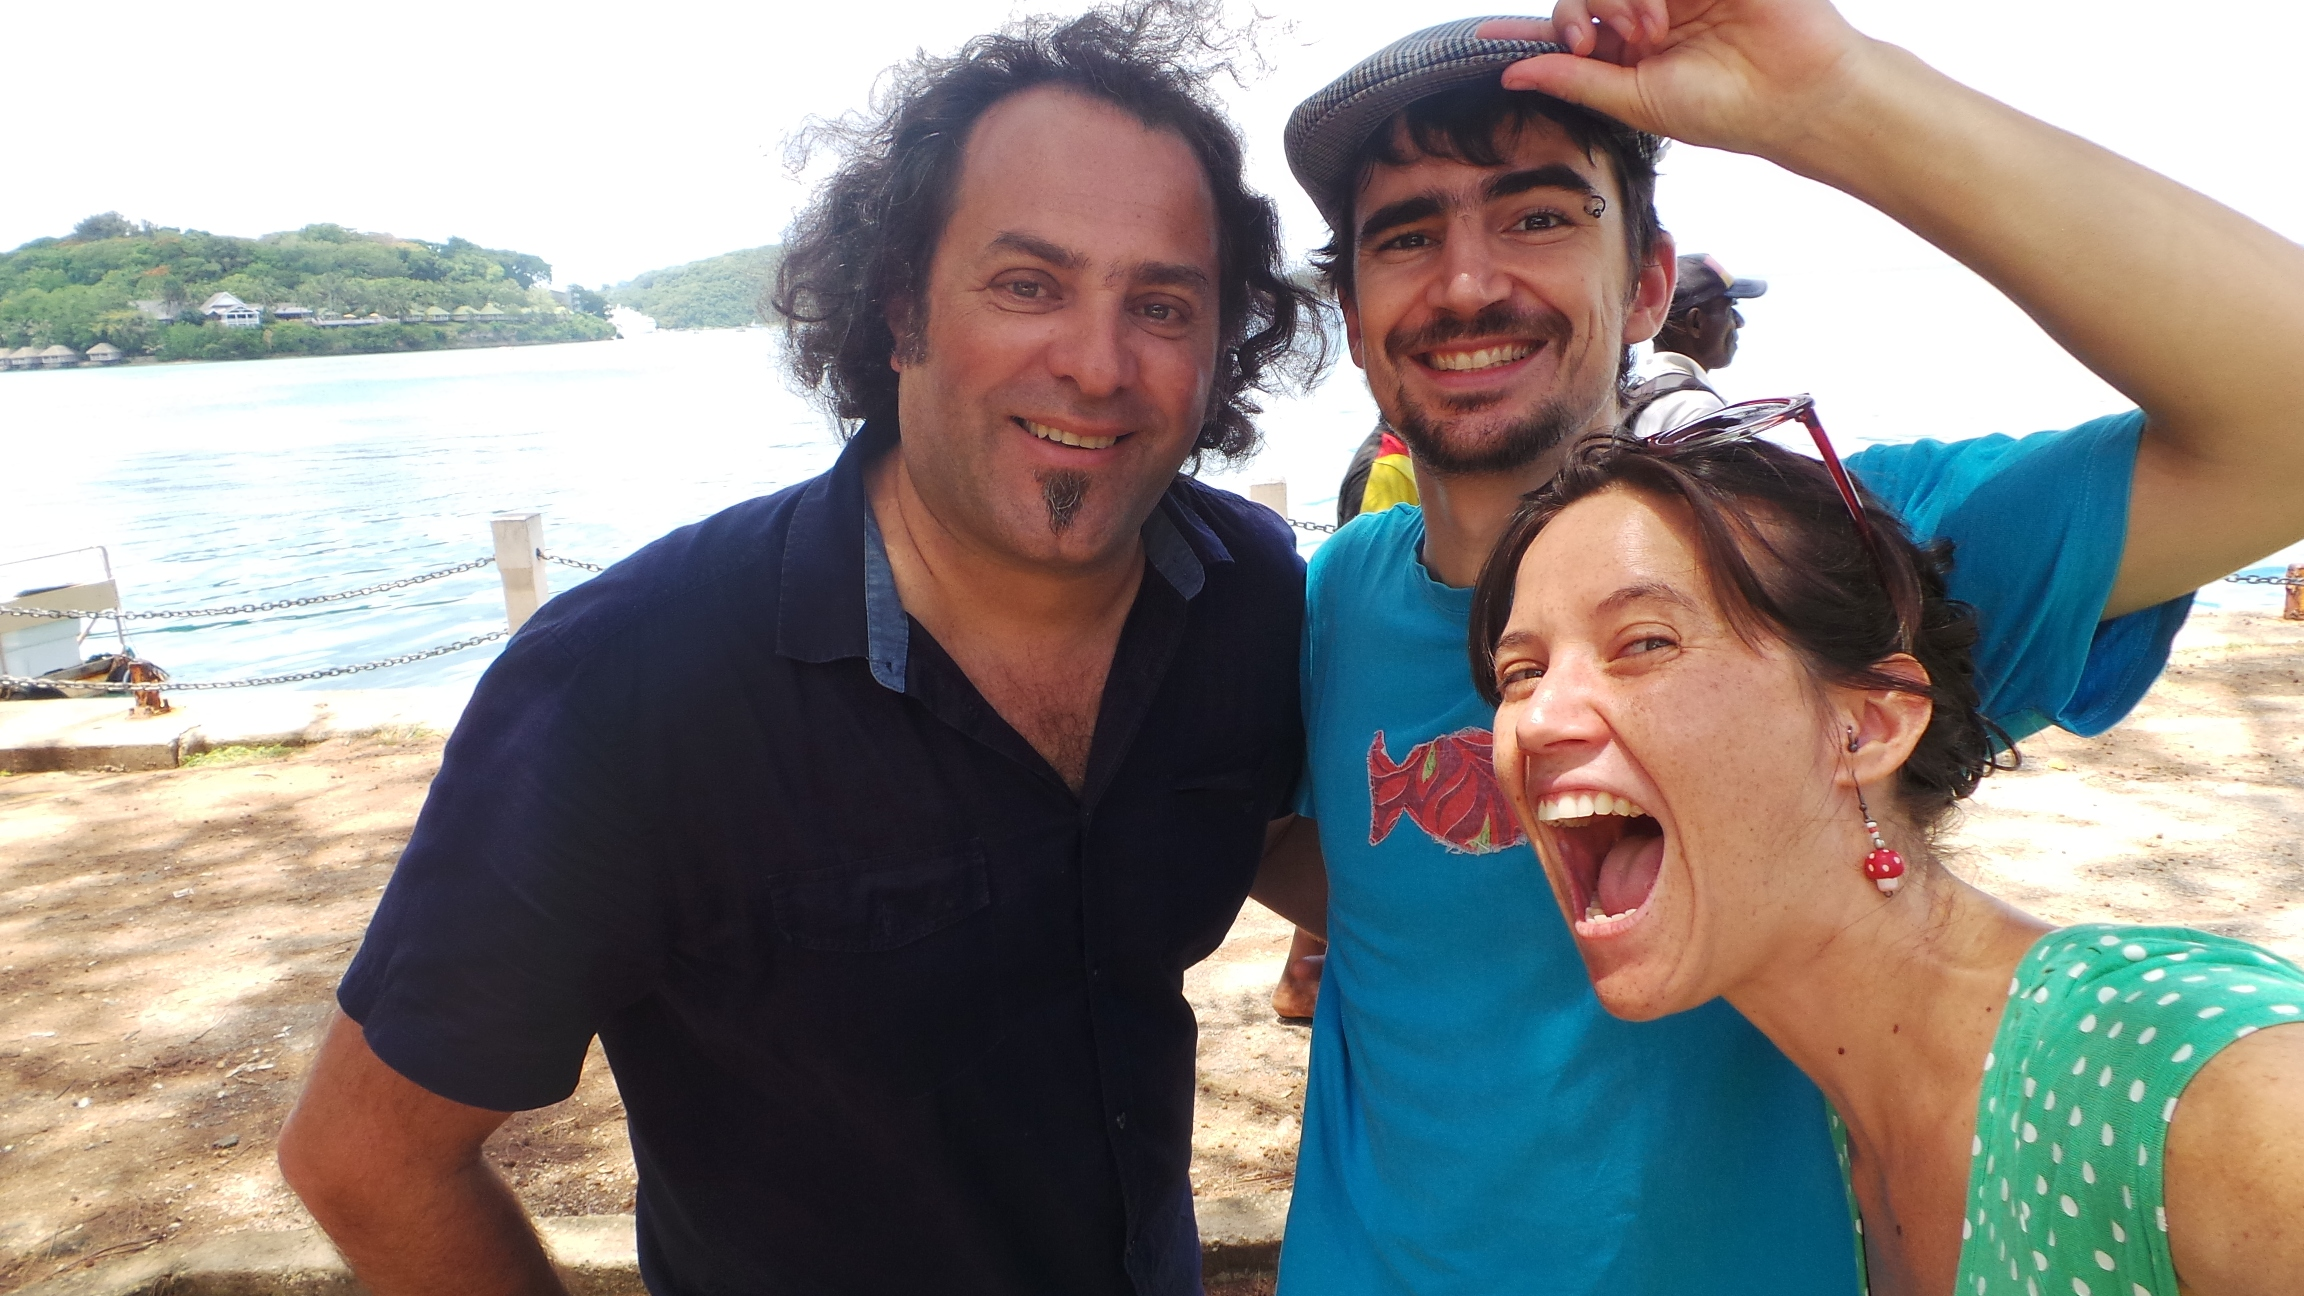 Vanuatu rencontres en ligne let's date site de rencontre